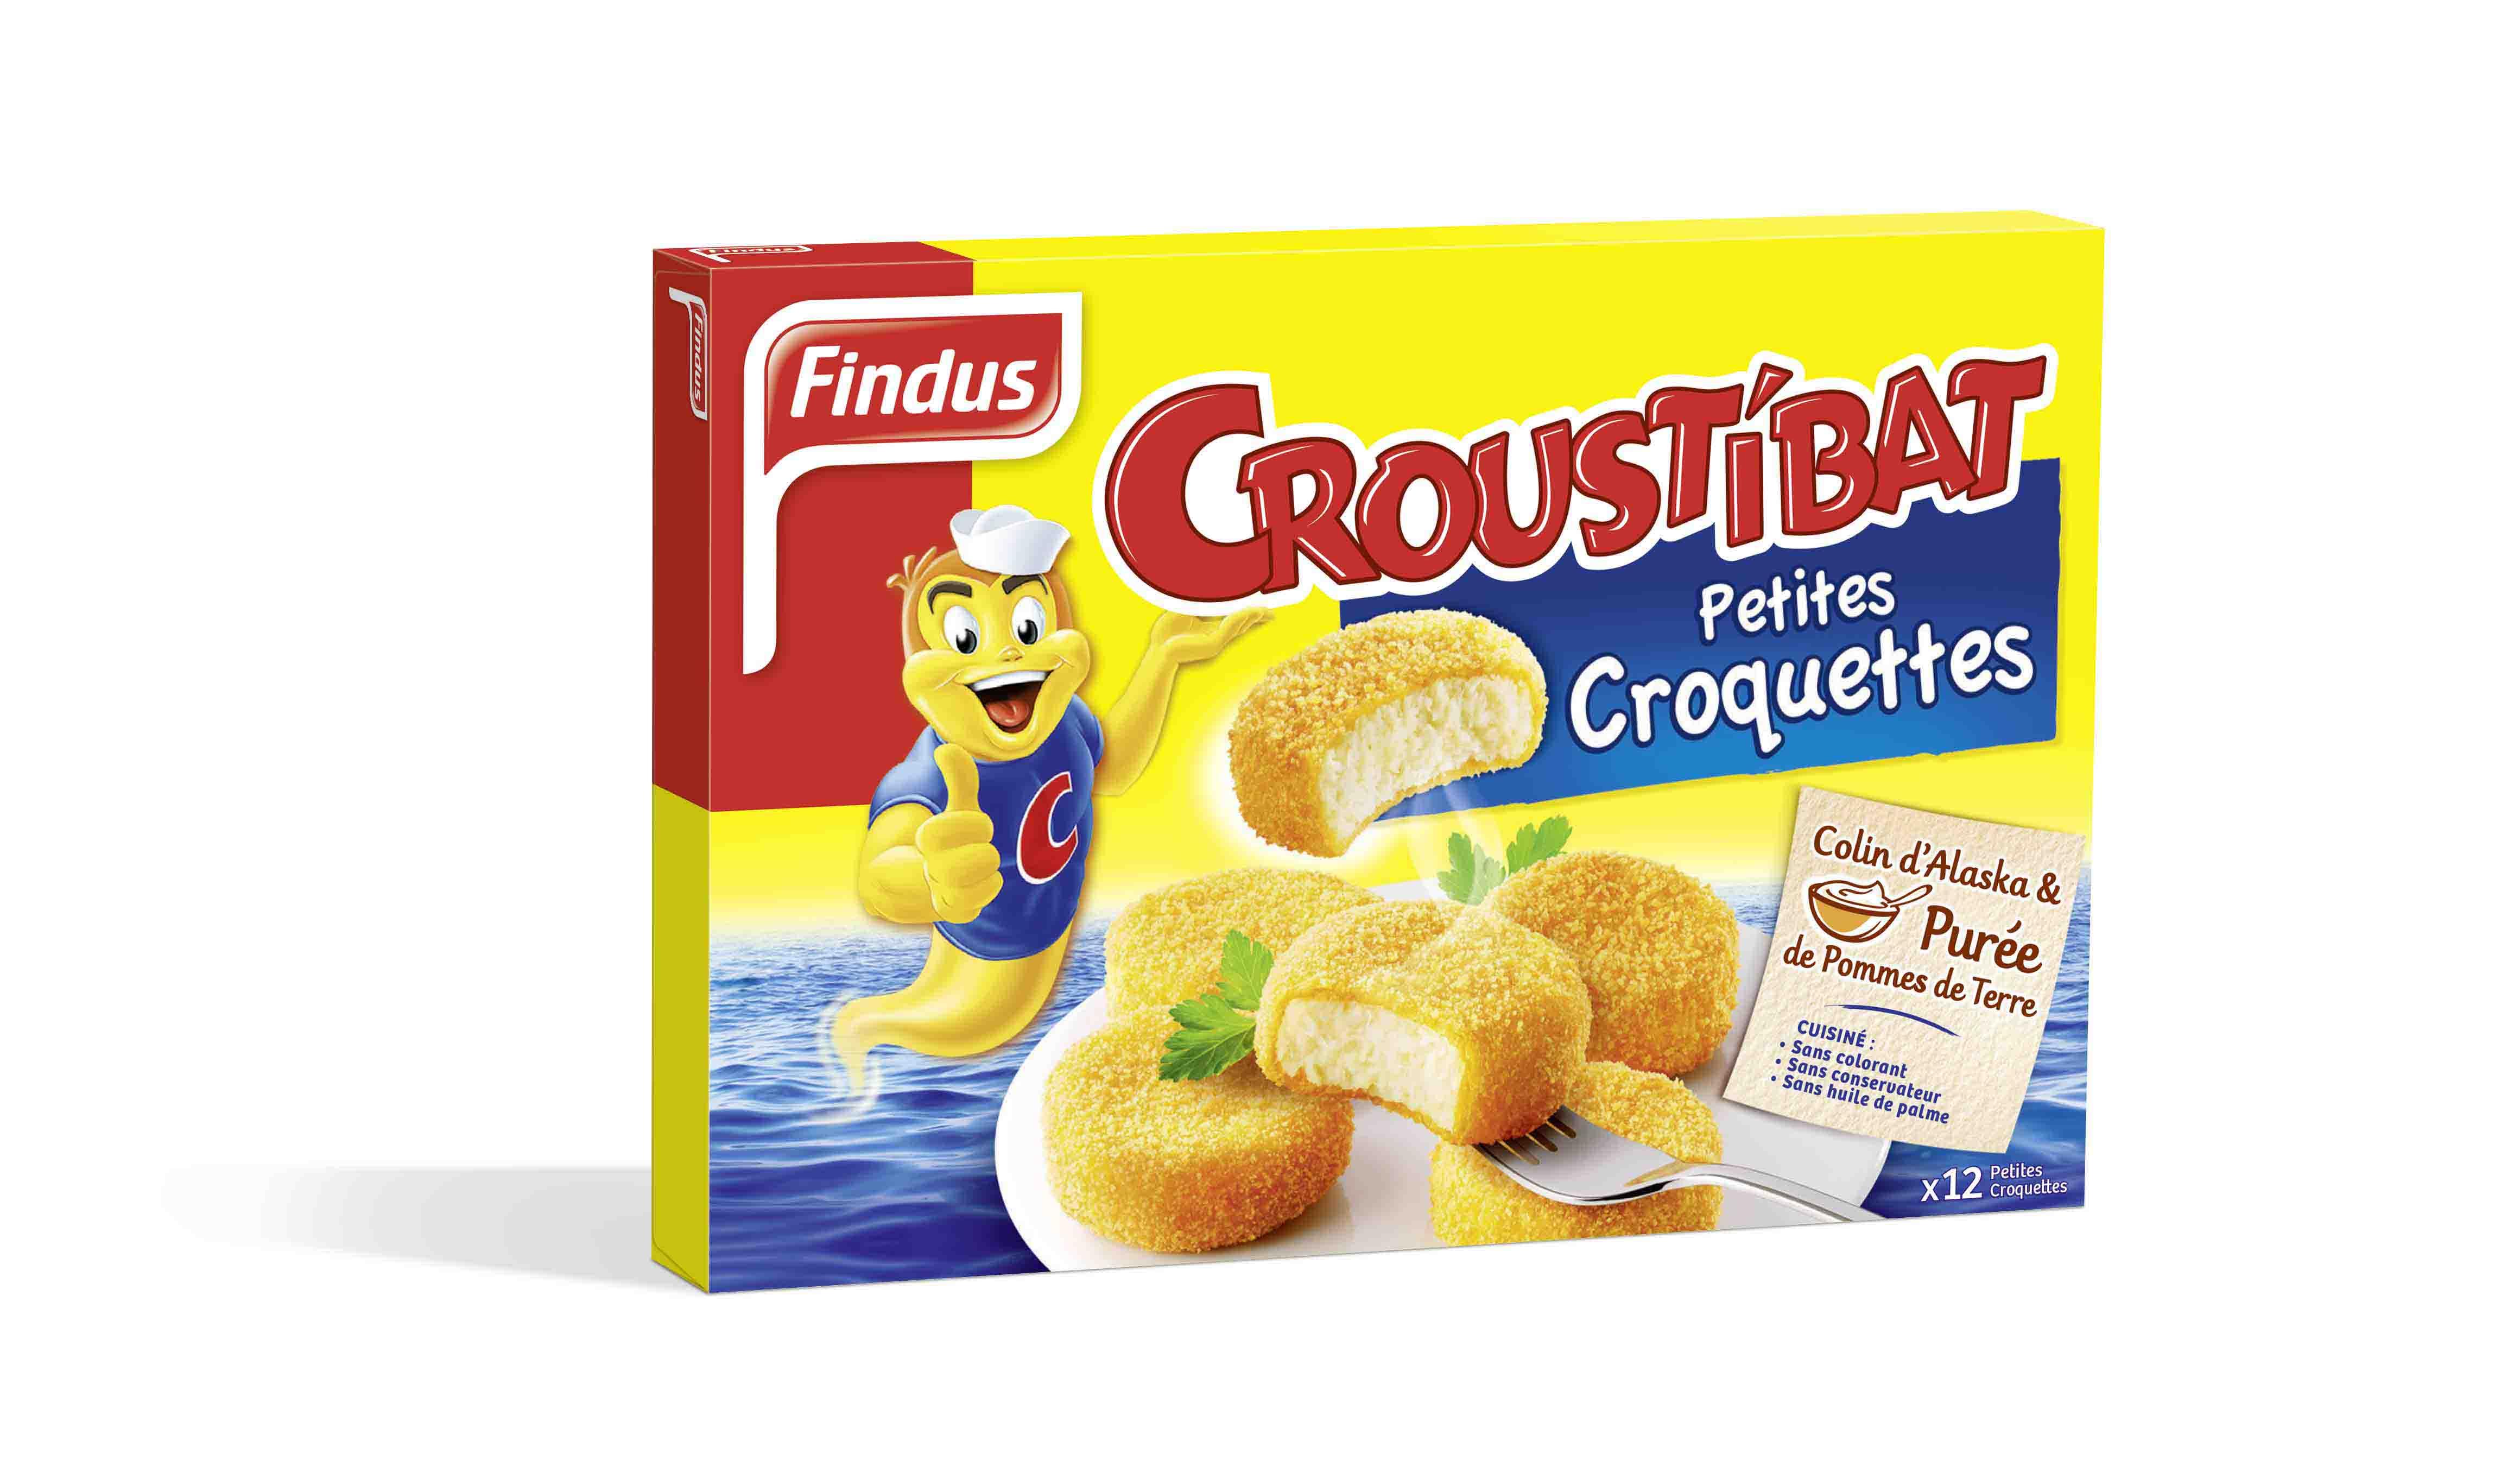 Findus Croustibat poisson pane petites galettes